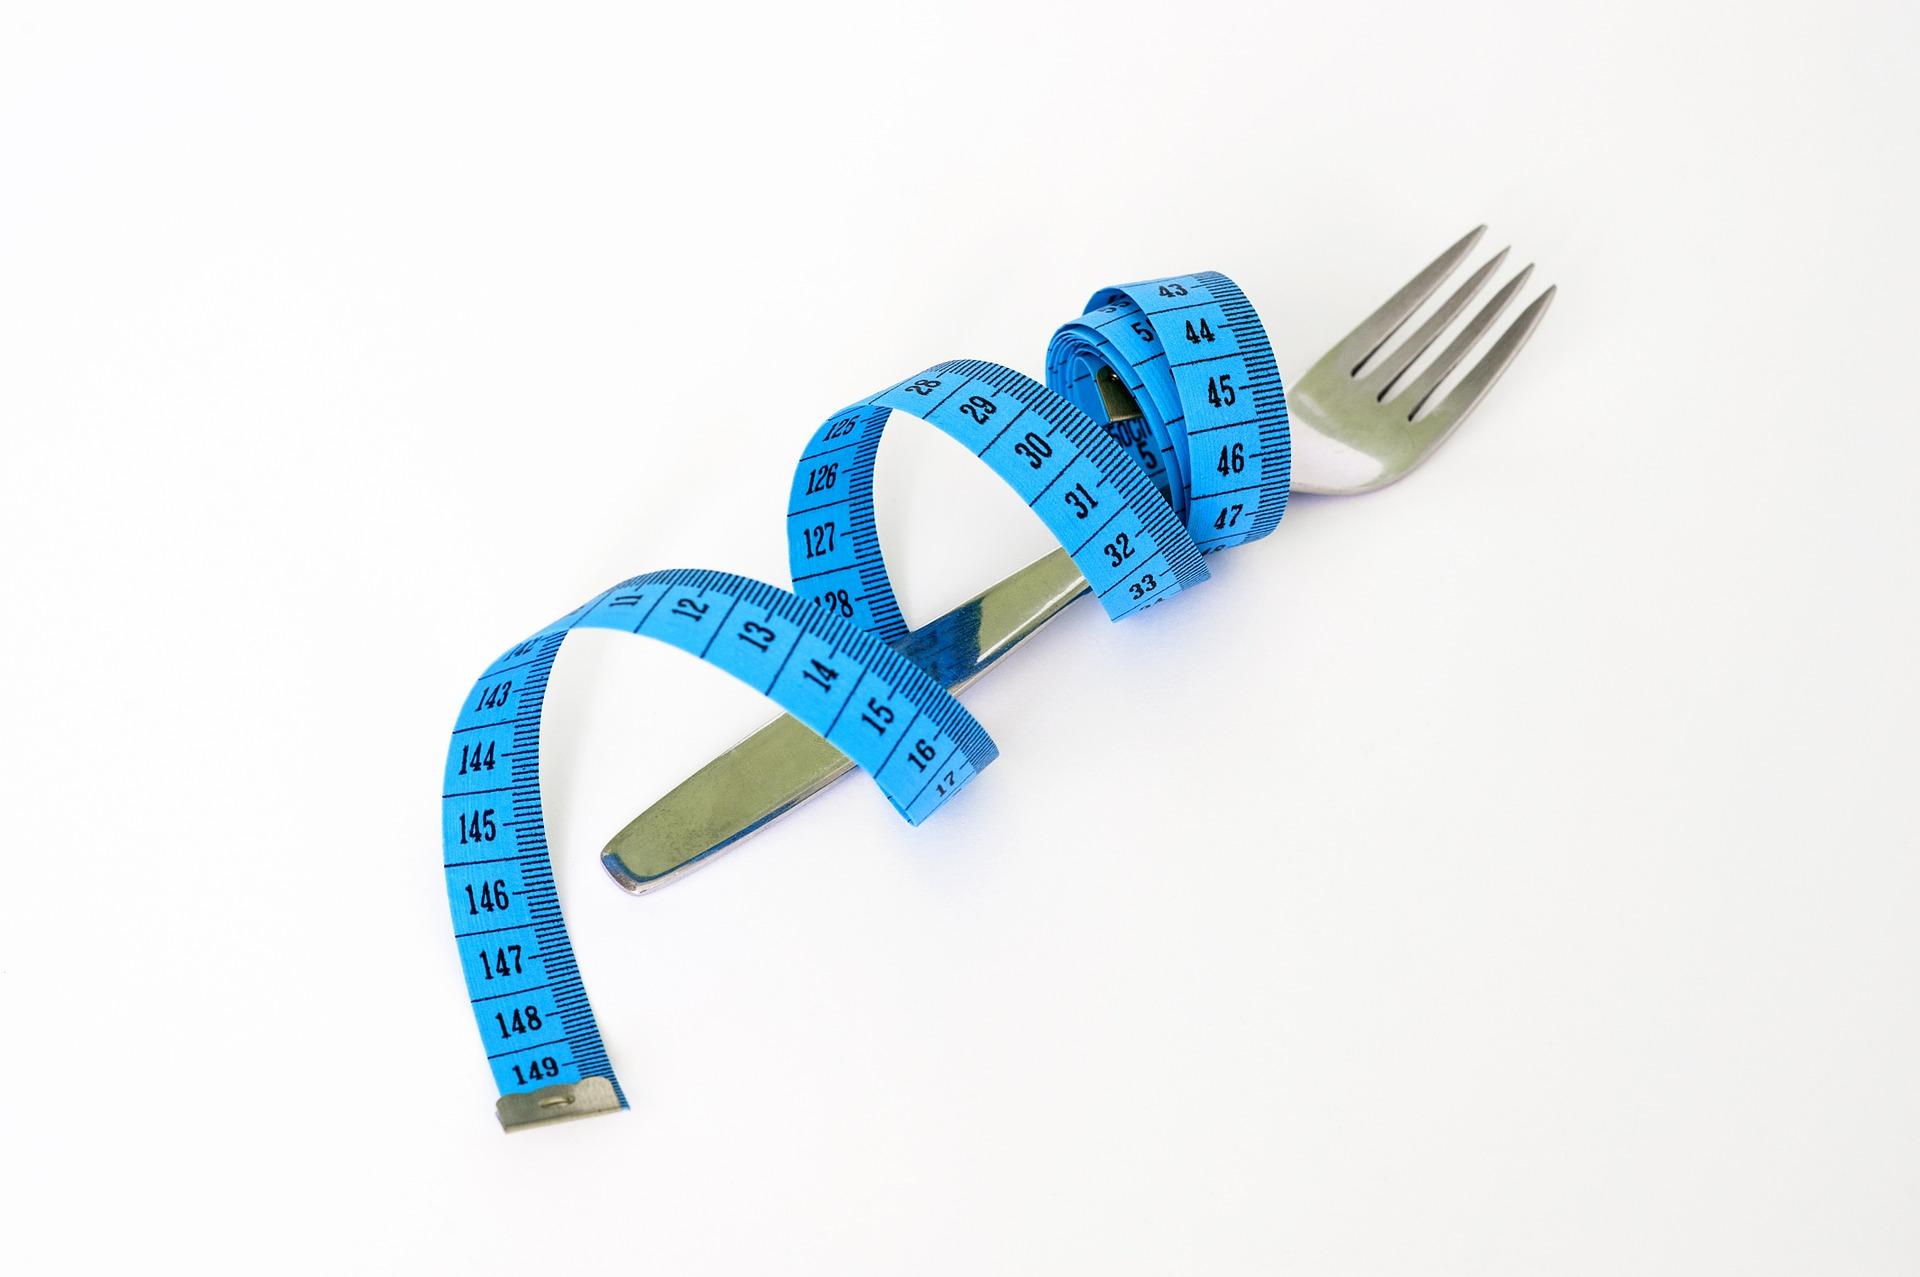 dieta brasiliana esempio